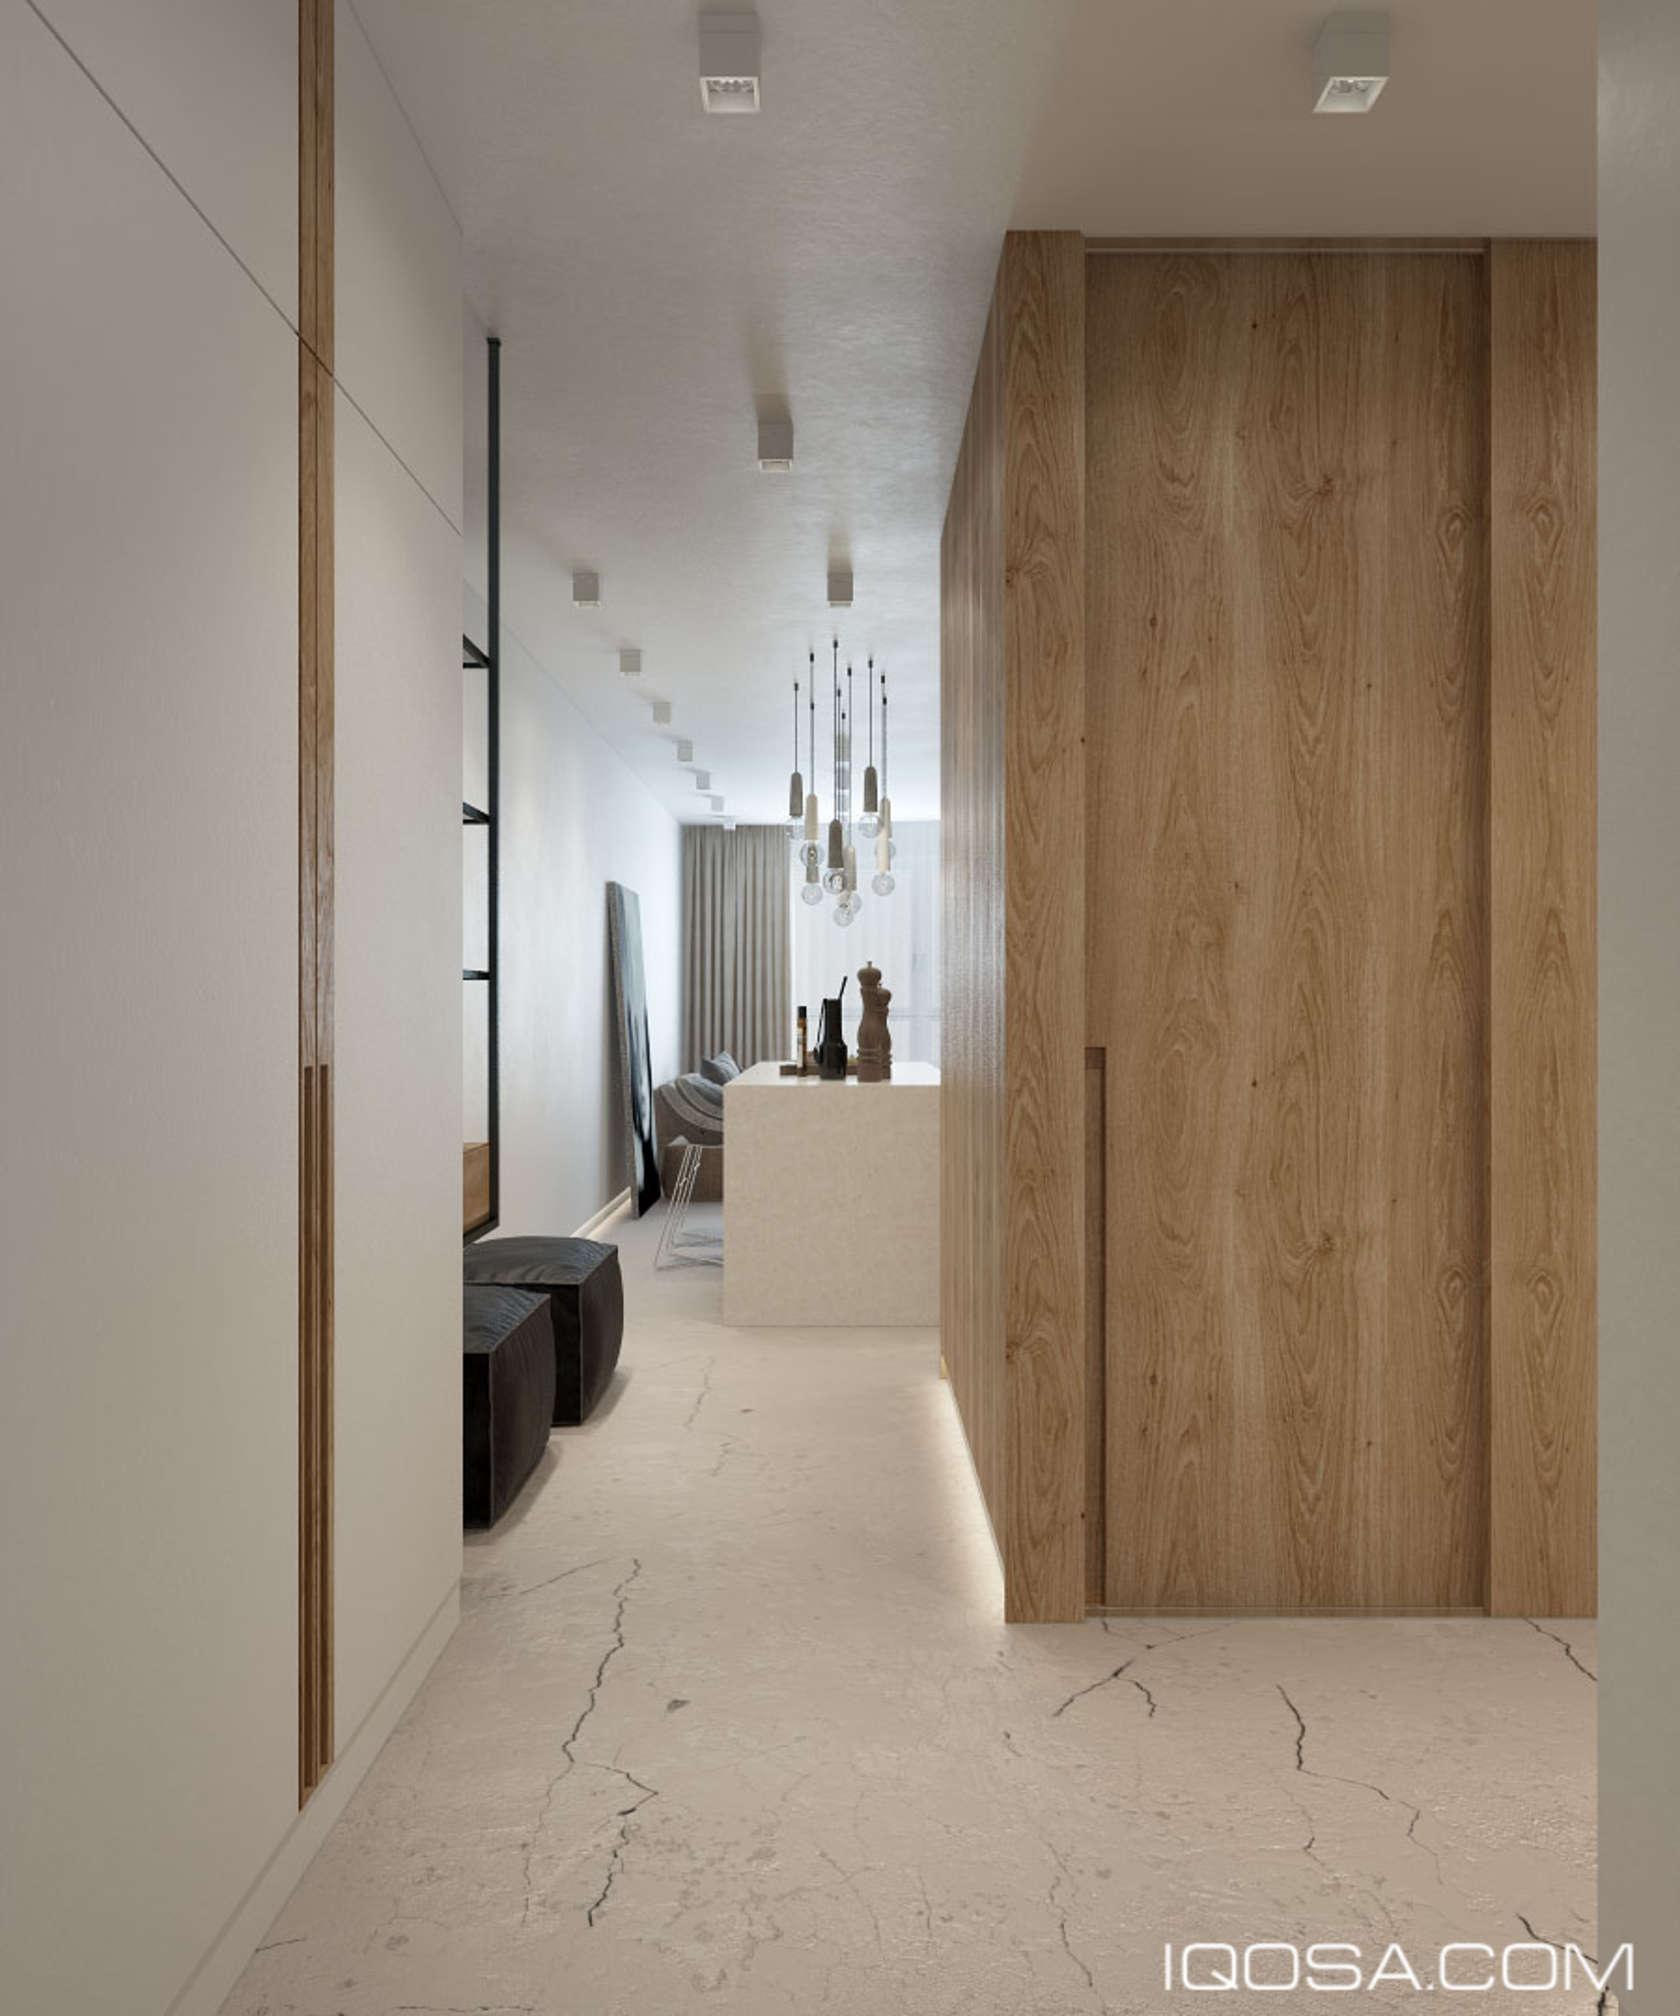 Wood apartment decor ideas